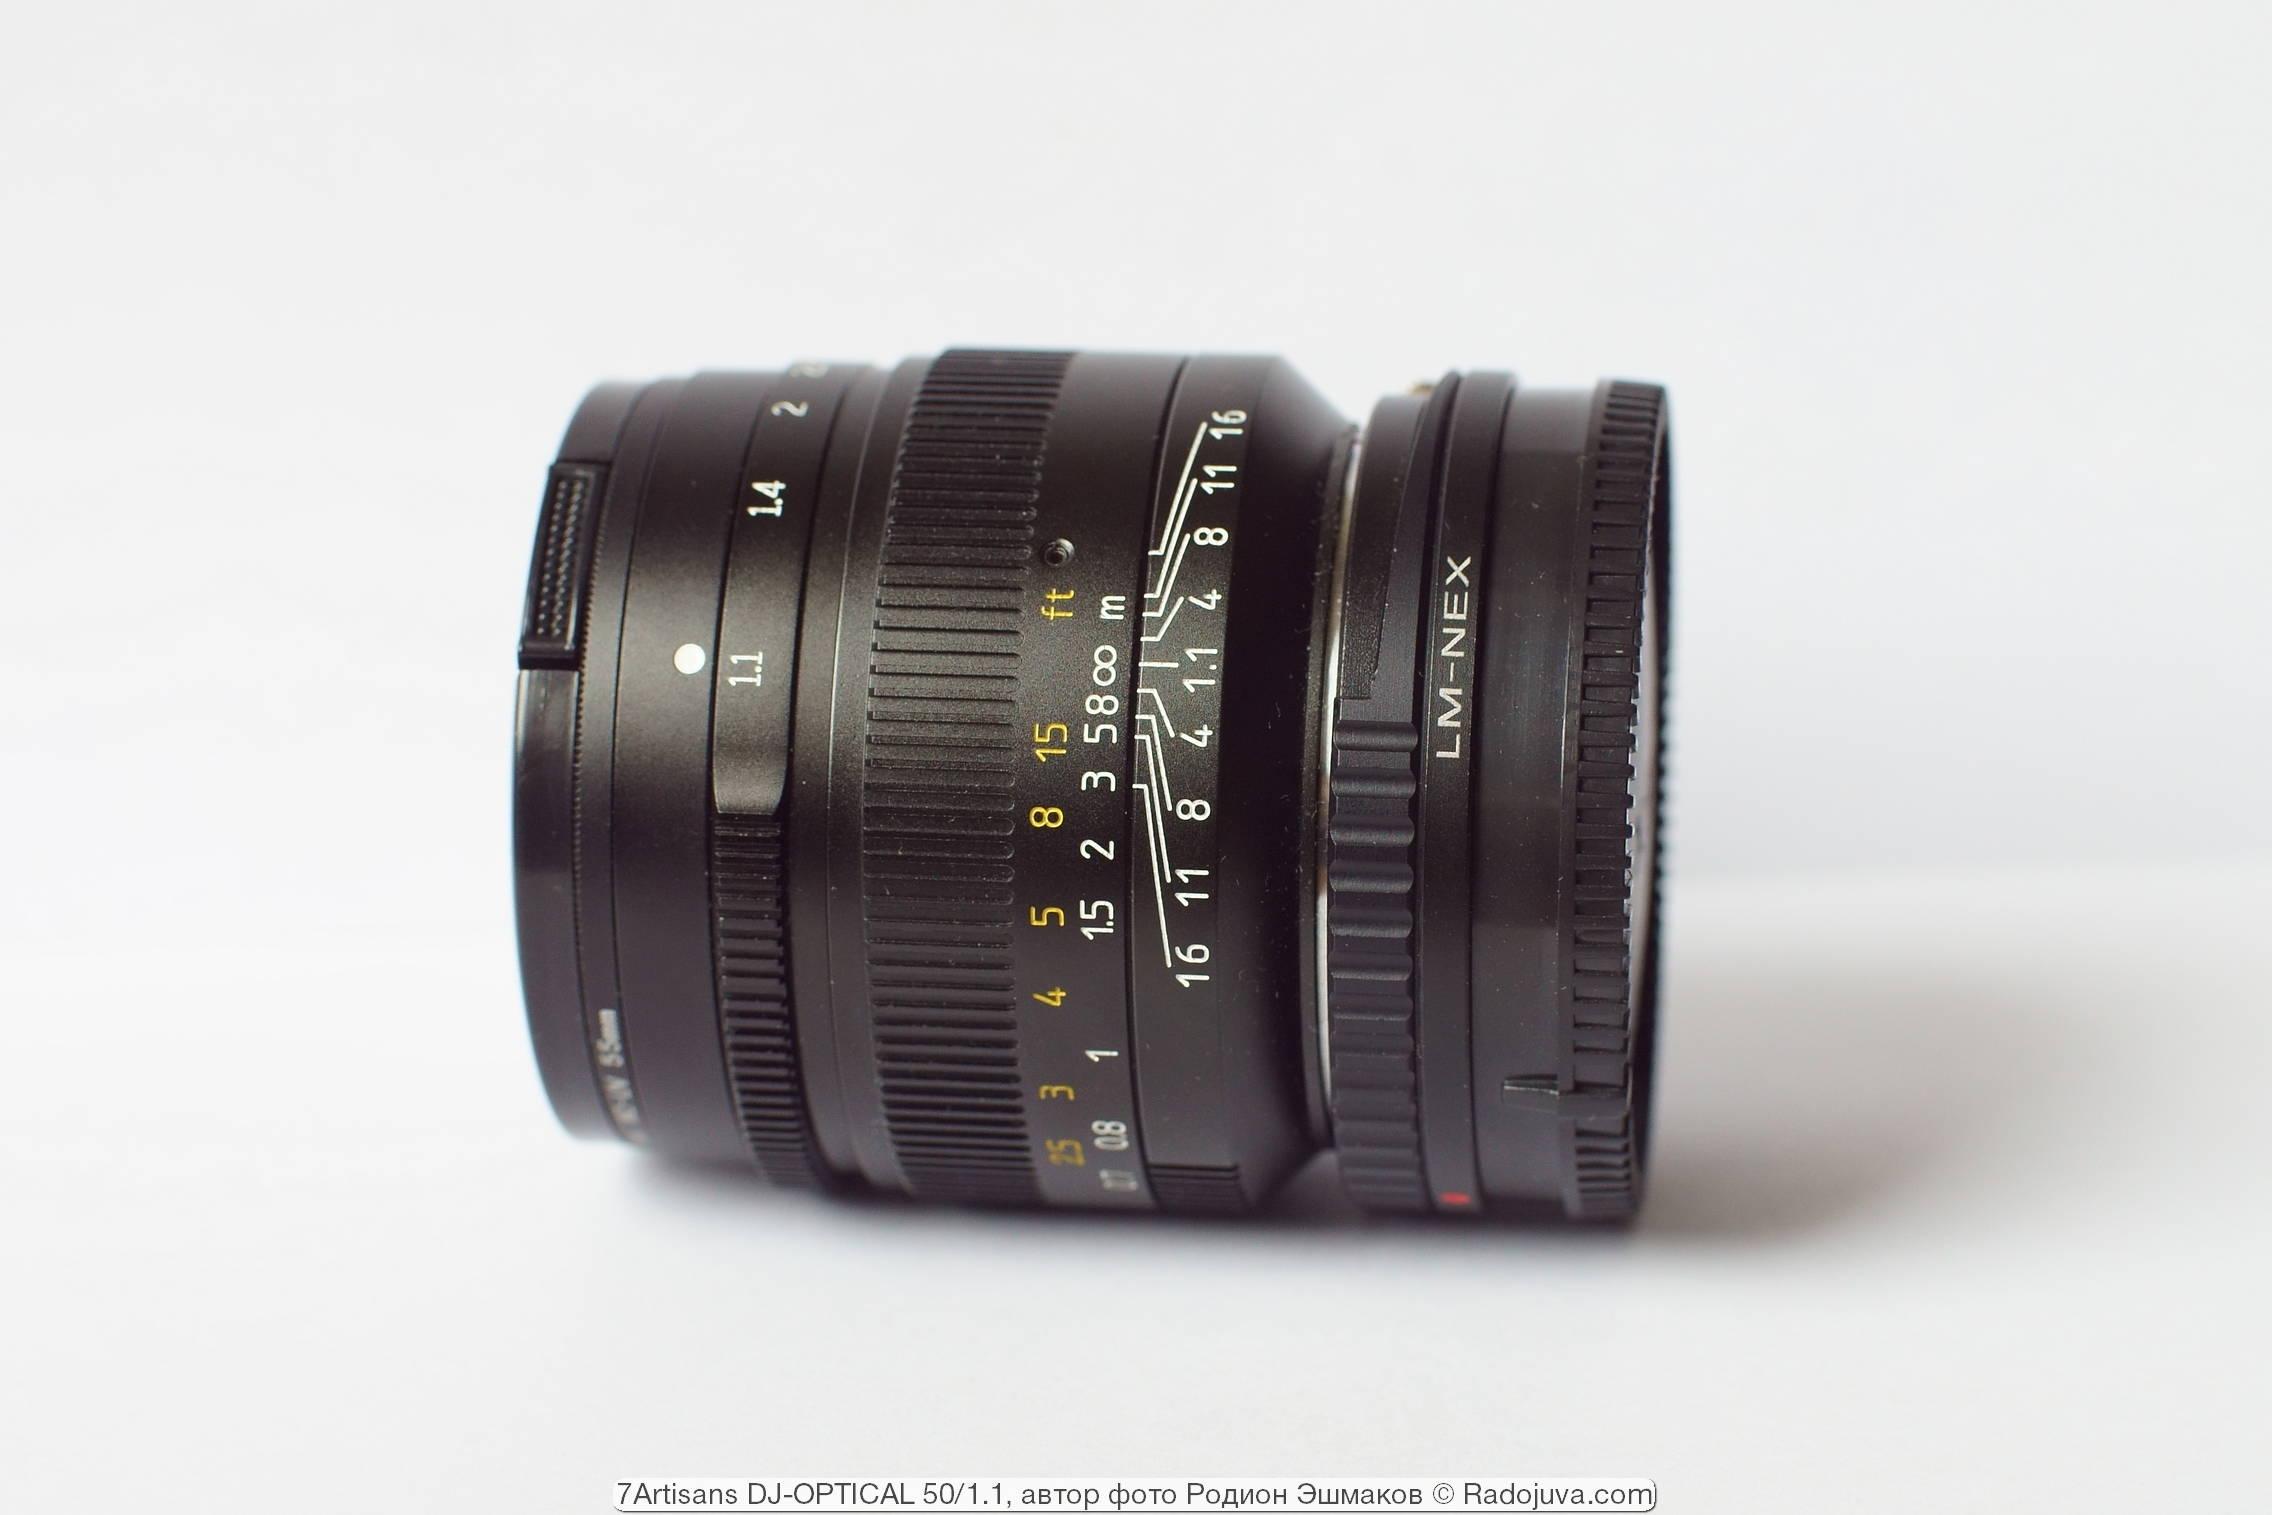 7artisans 50/1.1 в крышках с AliExpress, фильтром UV MC HD KnightX и с адаптером Leica M – NEX.